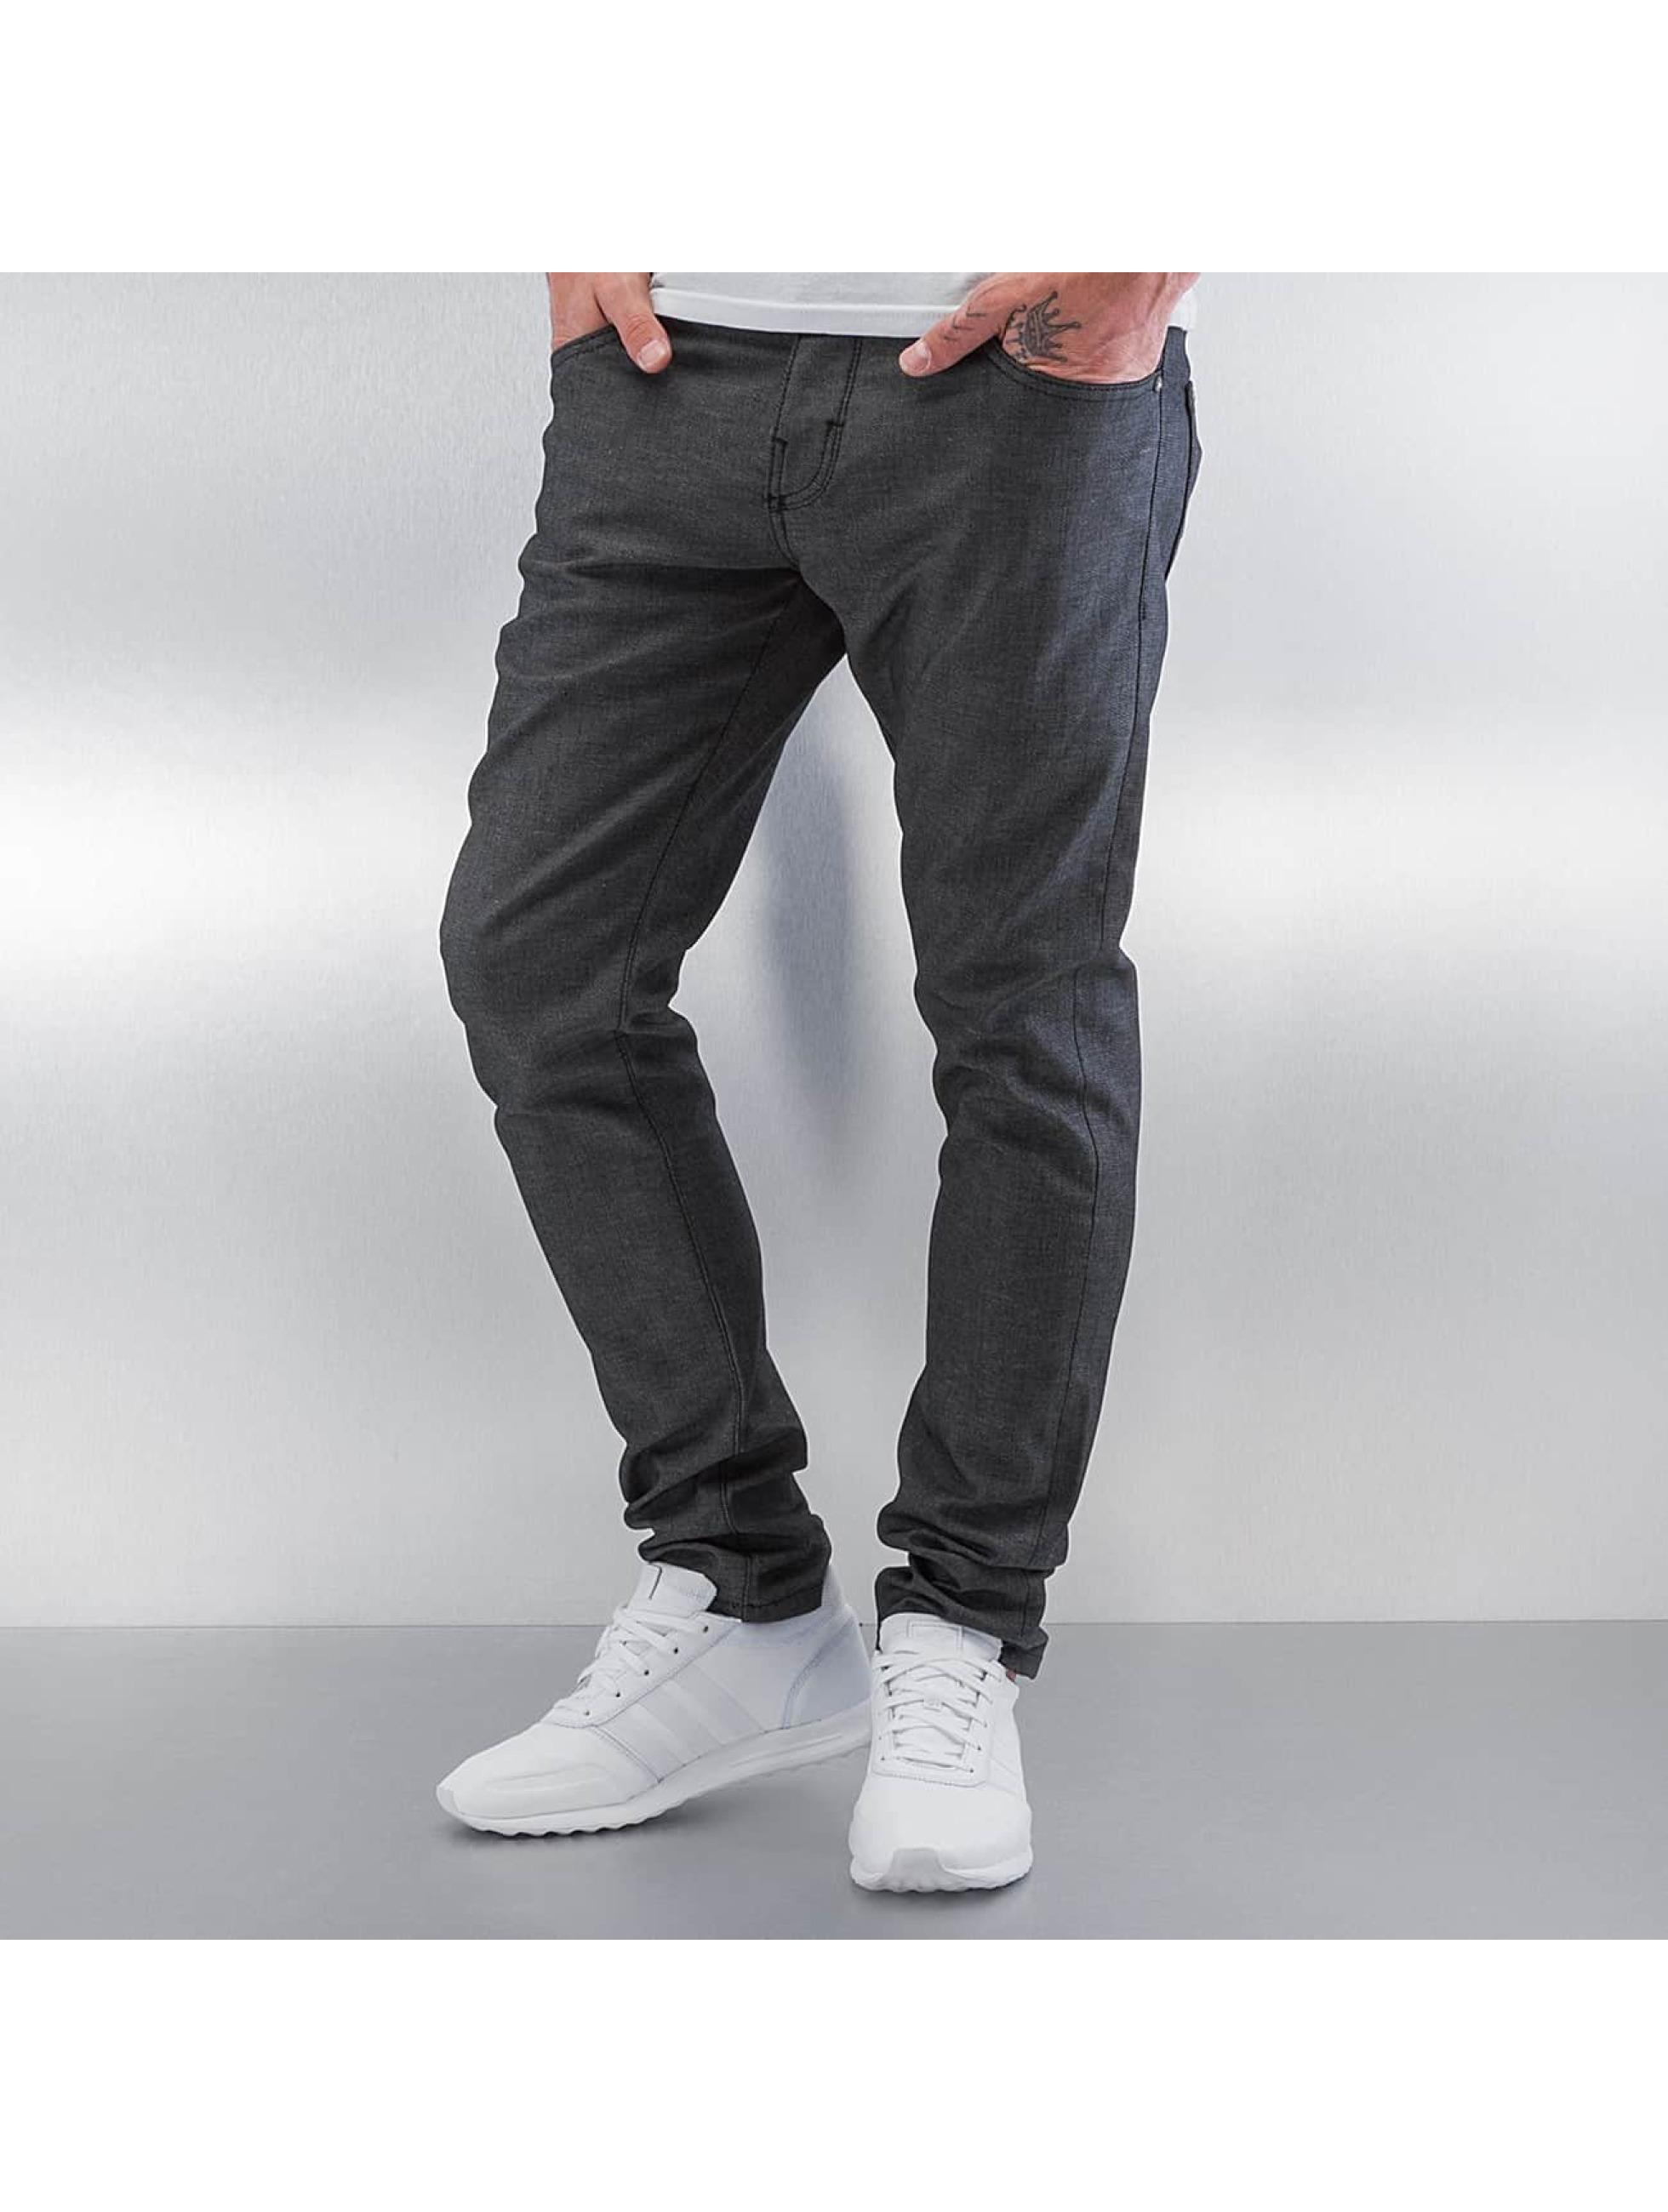 Pascucci Männer Skinny Jeans SANTA in grau